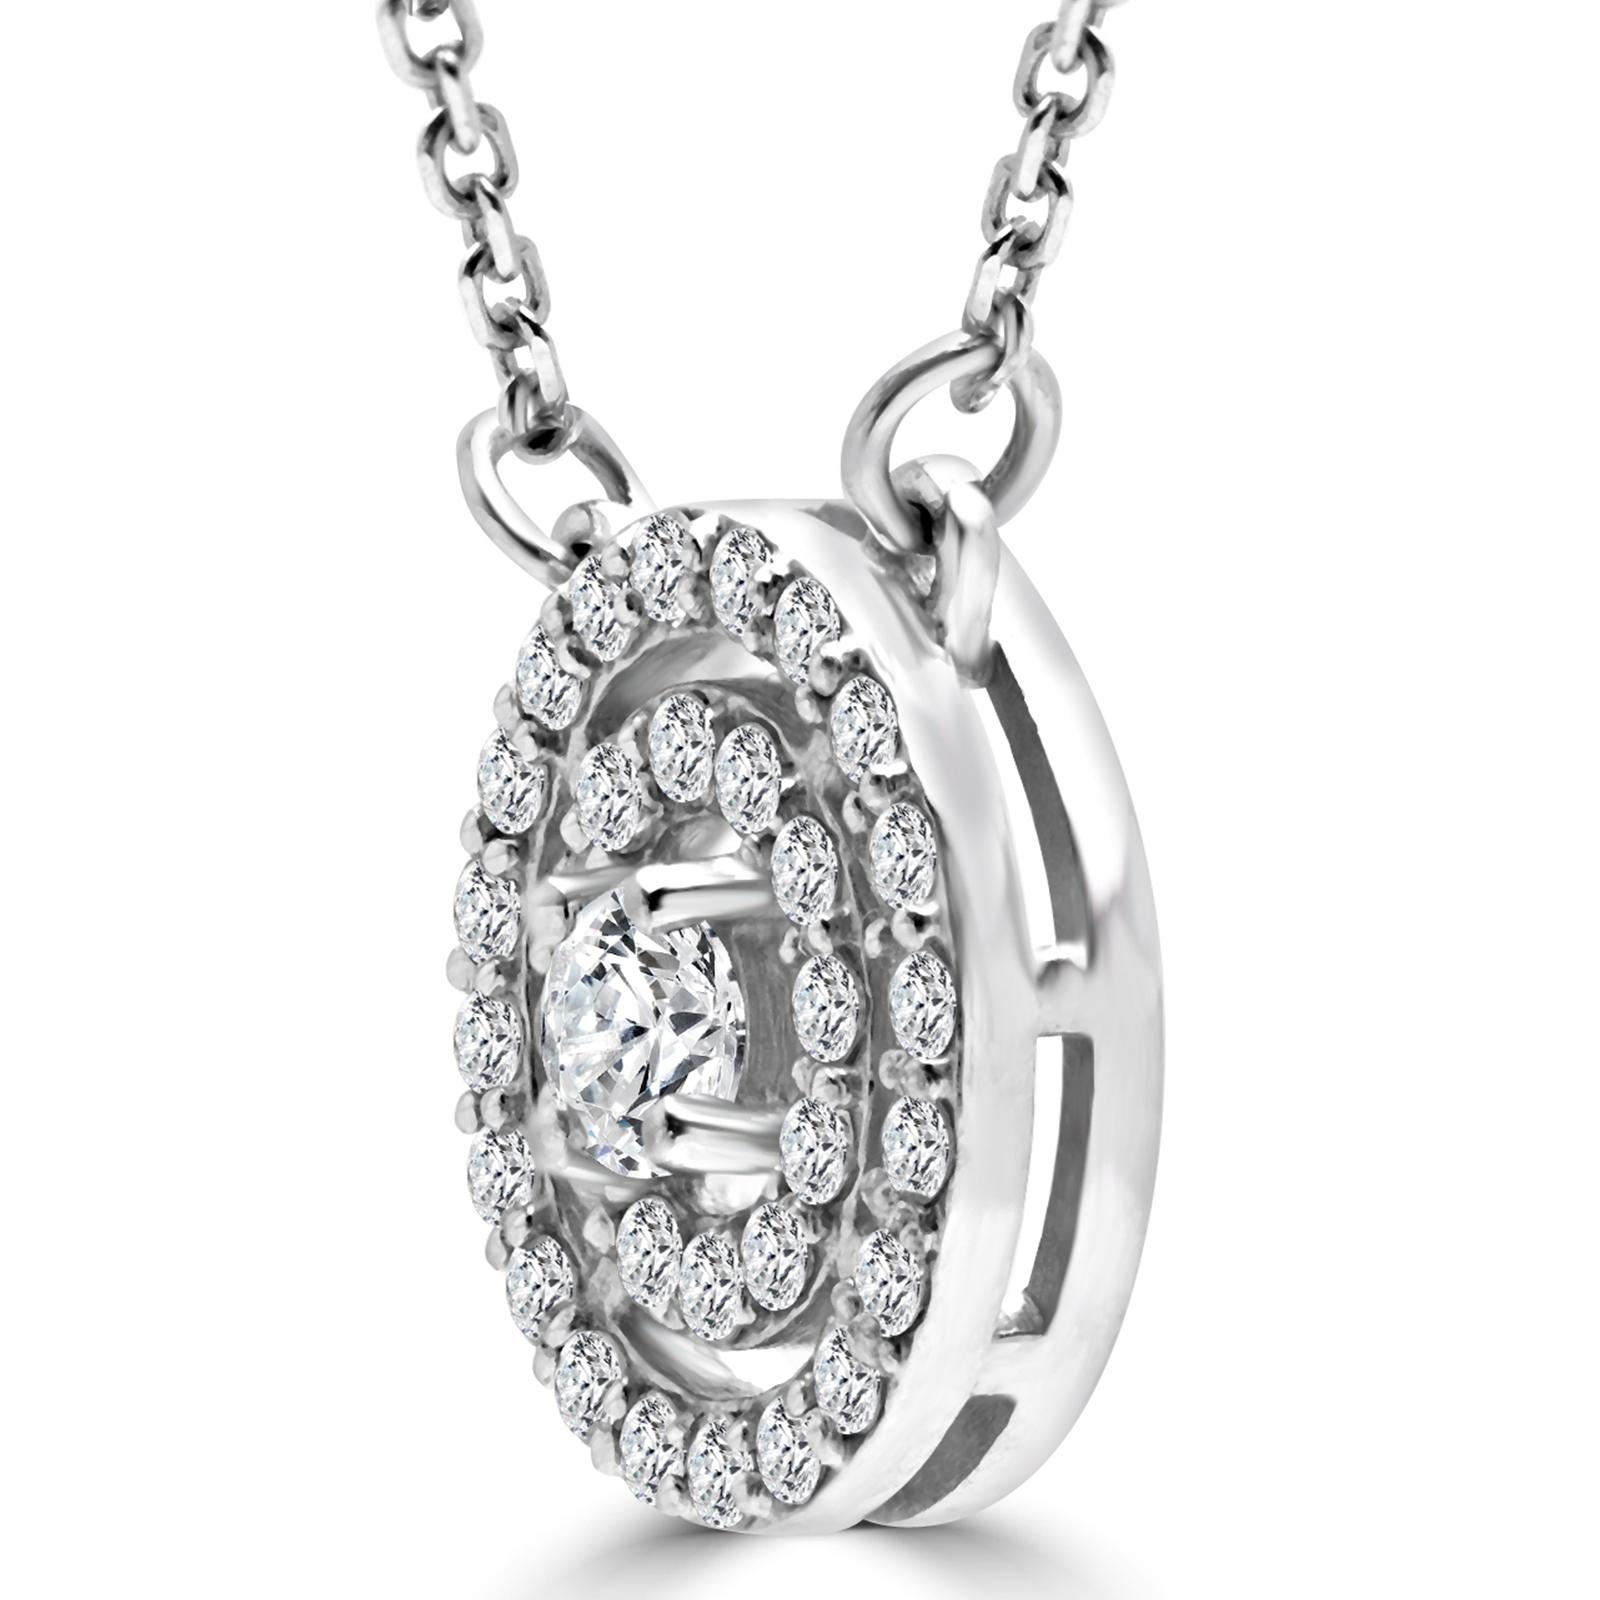 55 ct vs1 e round diamond circle pendant necklace 14k. Black Bedroom Furniture Sets. Home Design Ideas